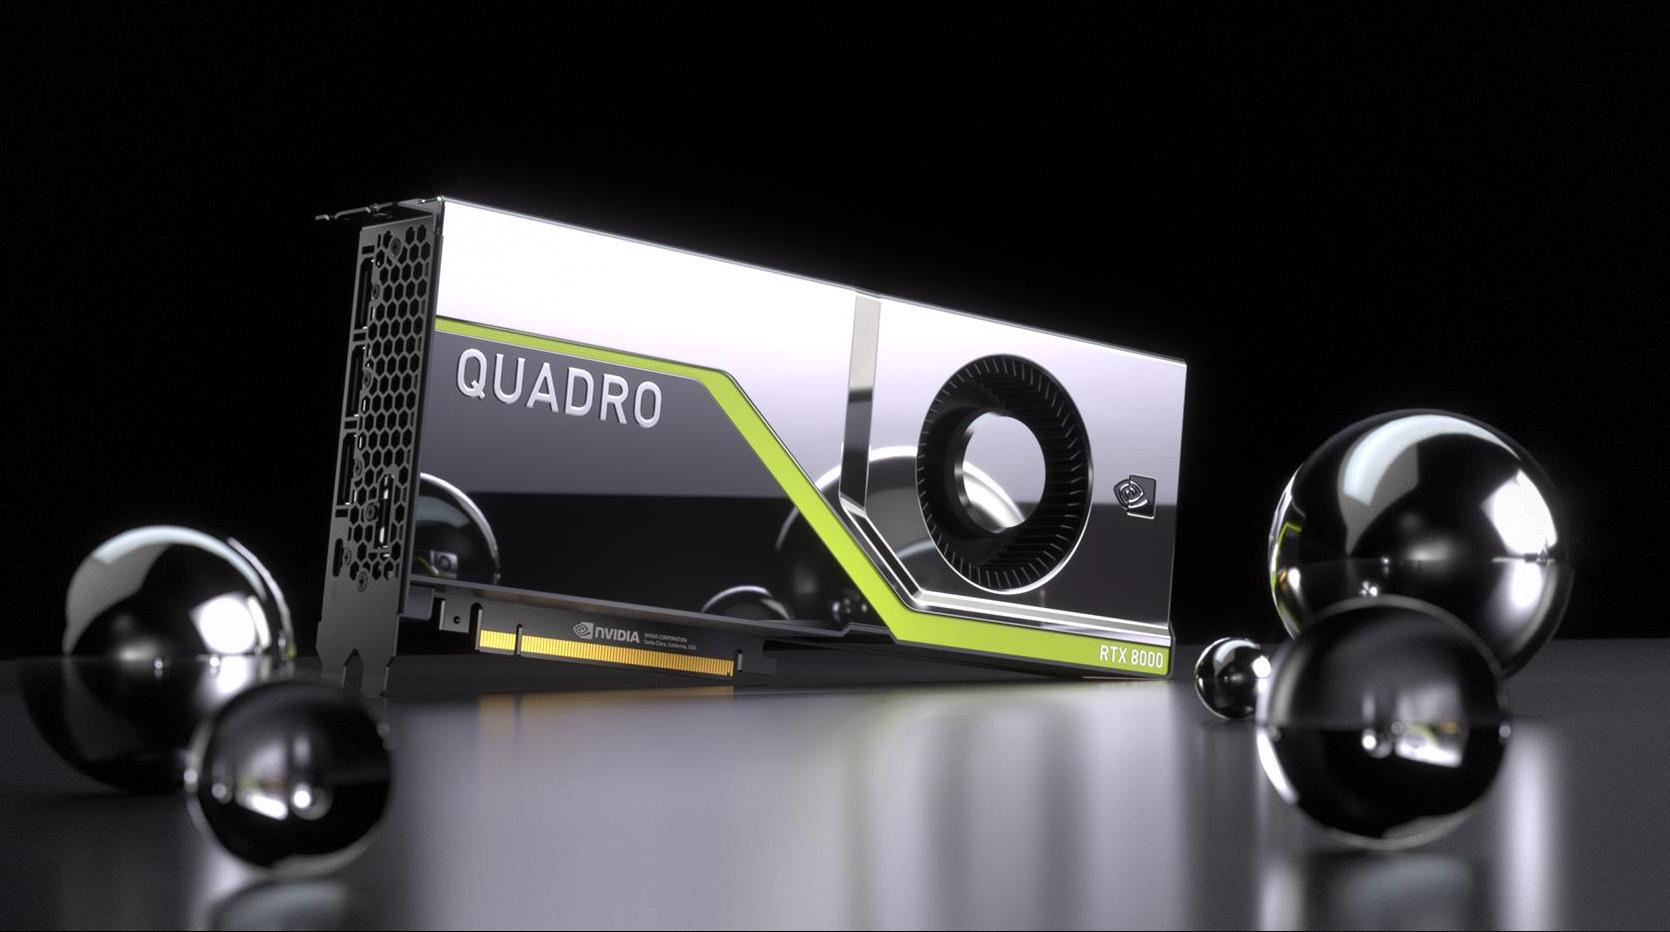 NVIDIA Quadro RTX (Ampere) Menampilkan GA102 GPU Dengan Lebih Dari 10.000 Core & 48 GB GDDR6 Memory